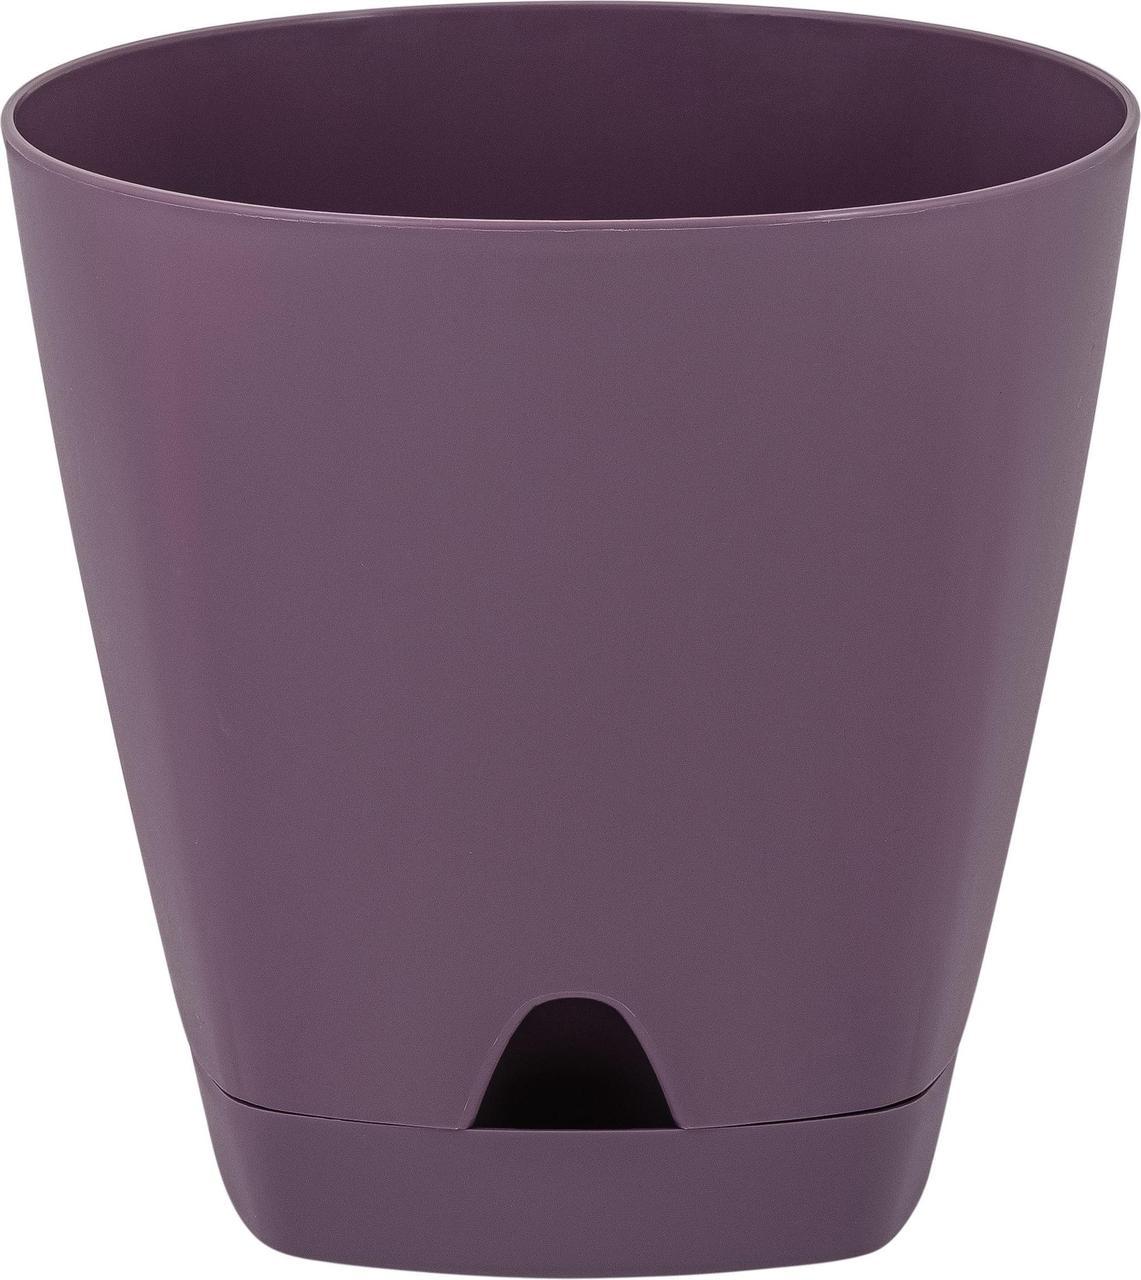 Горшок для цветов AMSTERDAM D 200 mm/4l с прикорневым поливом Морозная слива